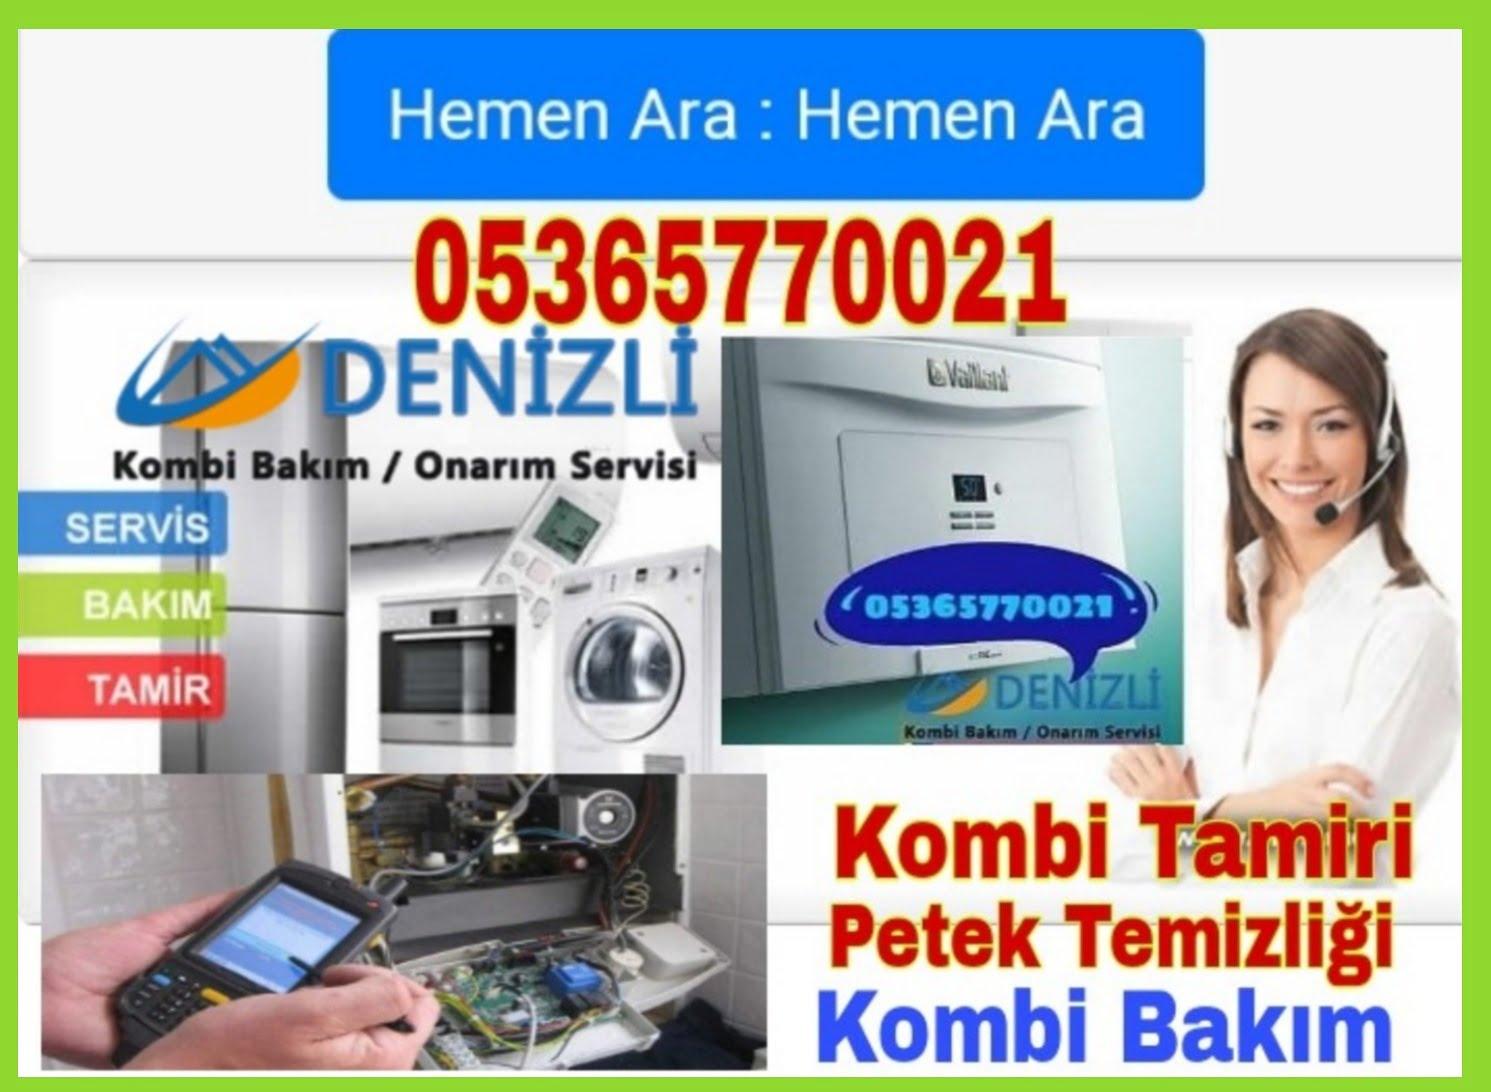 IMG_20210422_234133_558